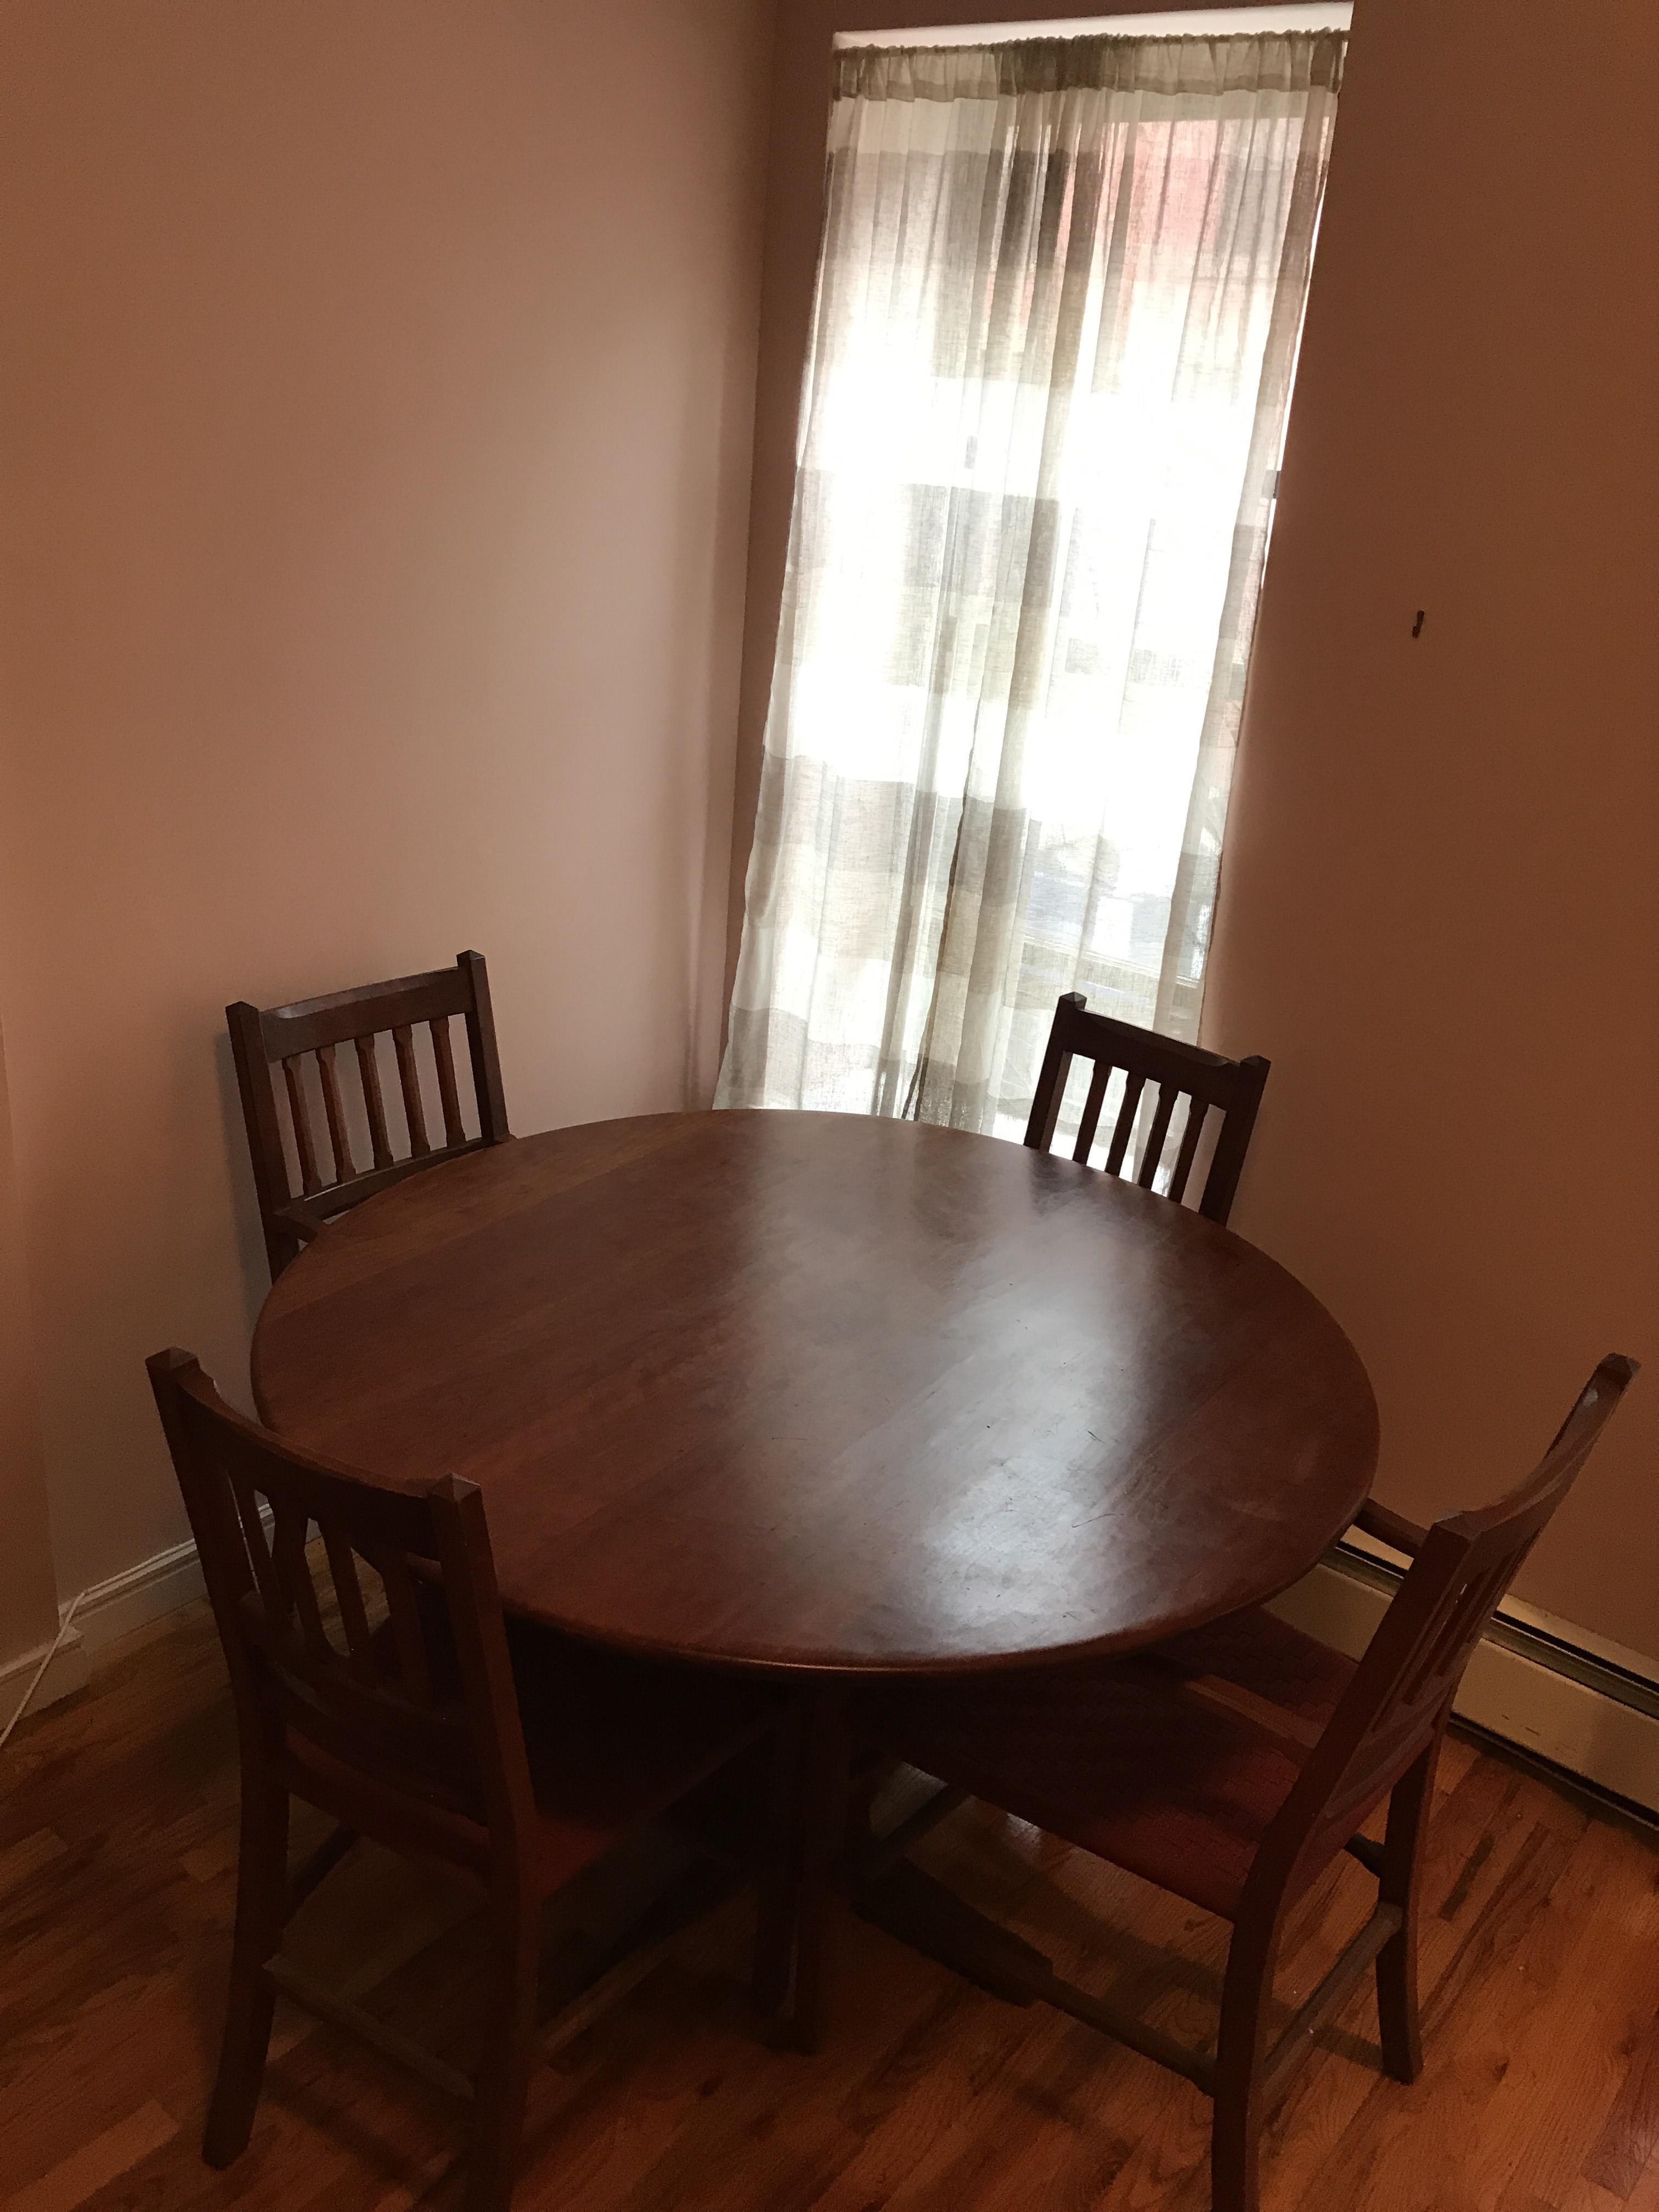 Arts & Craft Custom Table w/ 4 Chairs